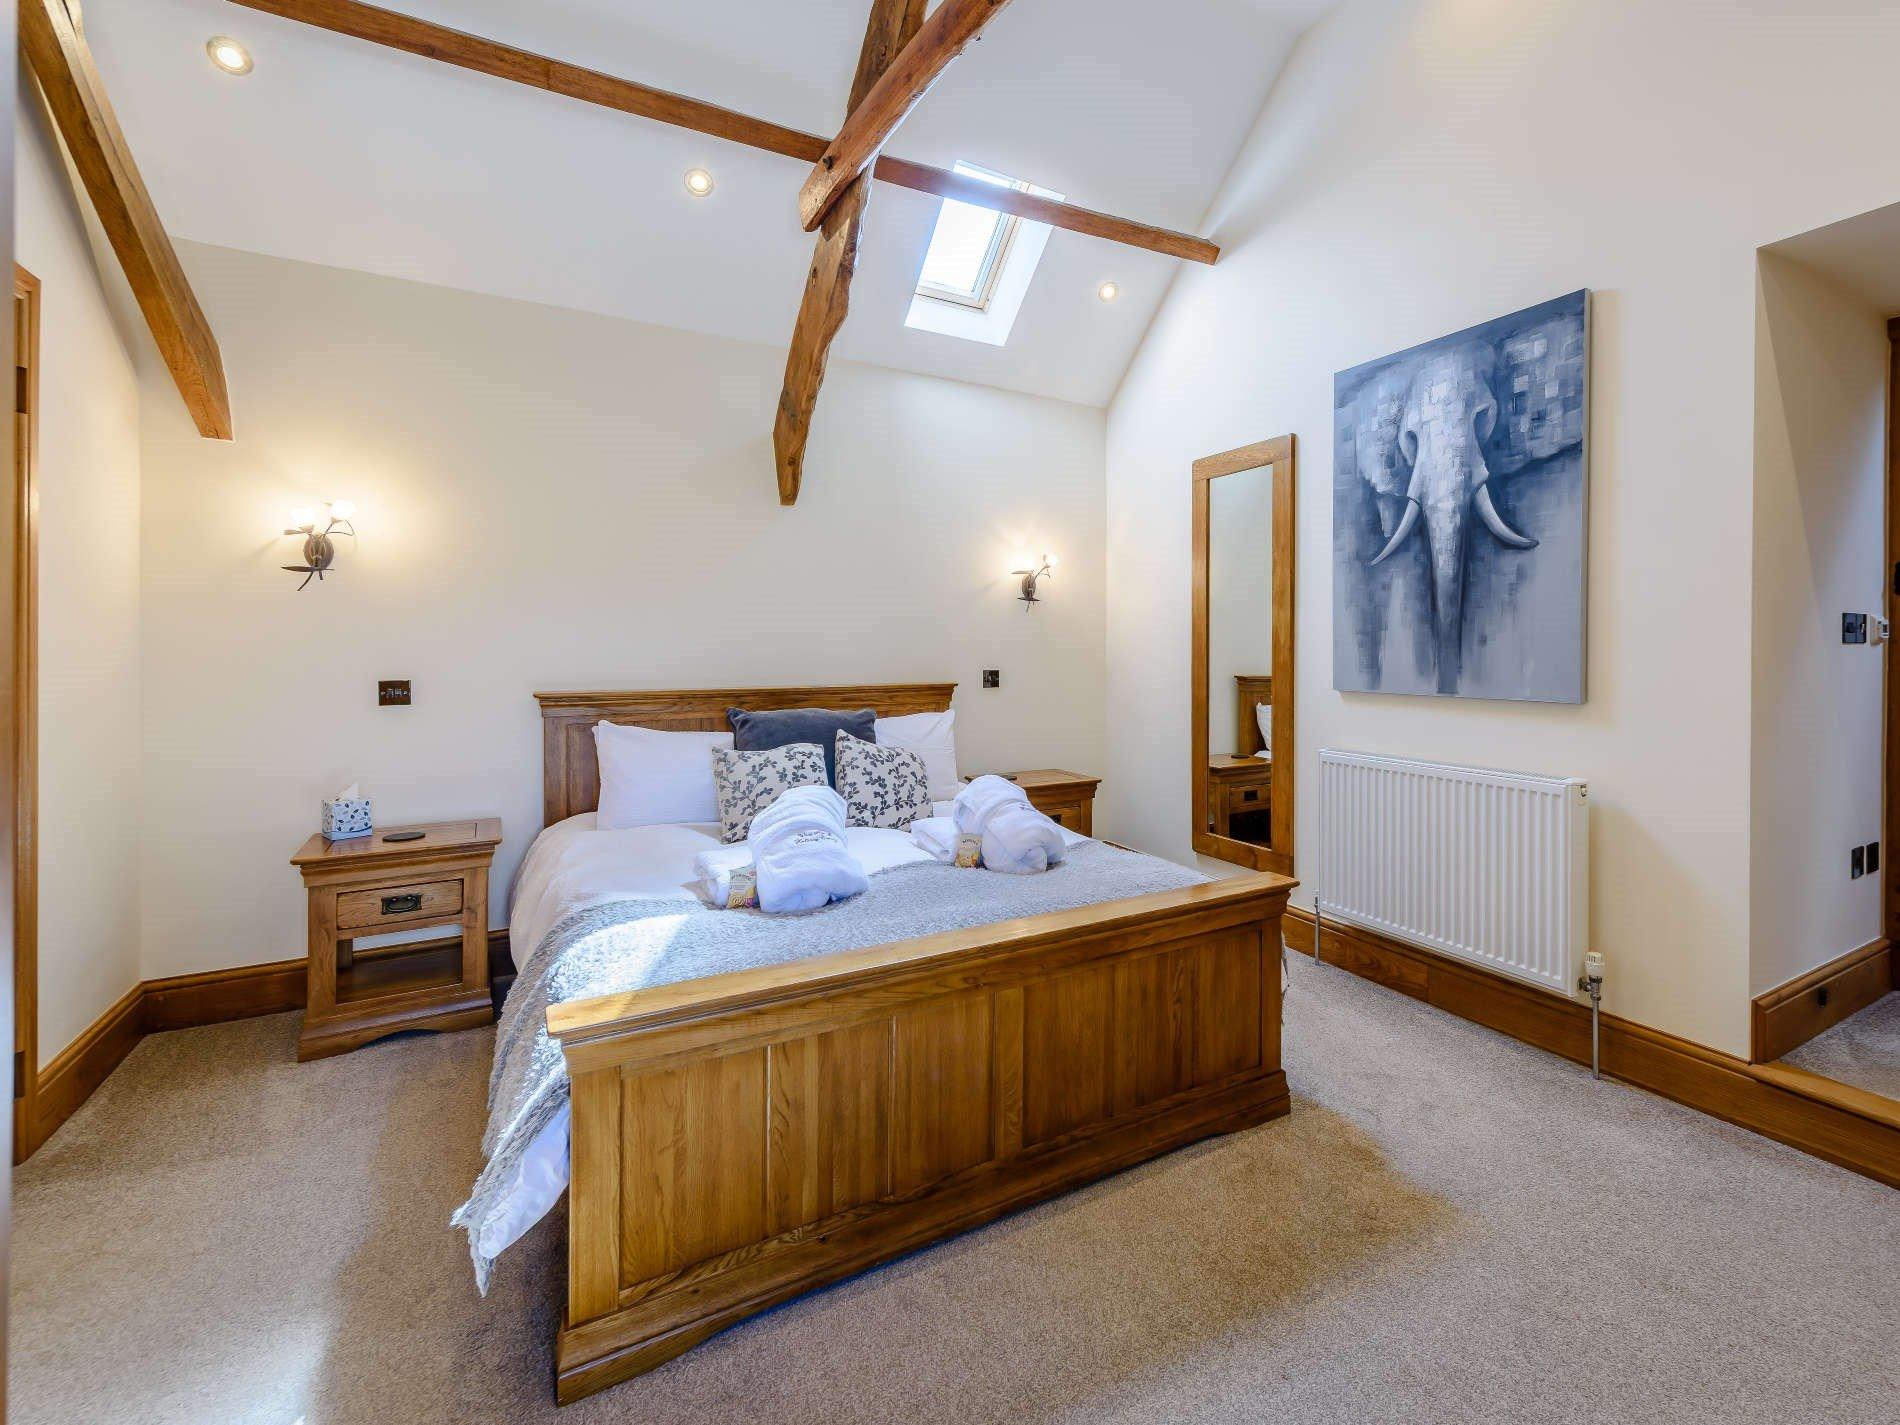 3 Bedroom Cottage in Okehampton, Devon